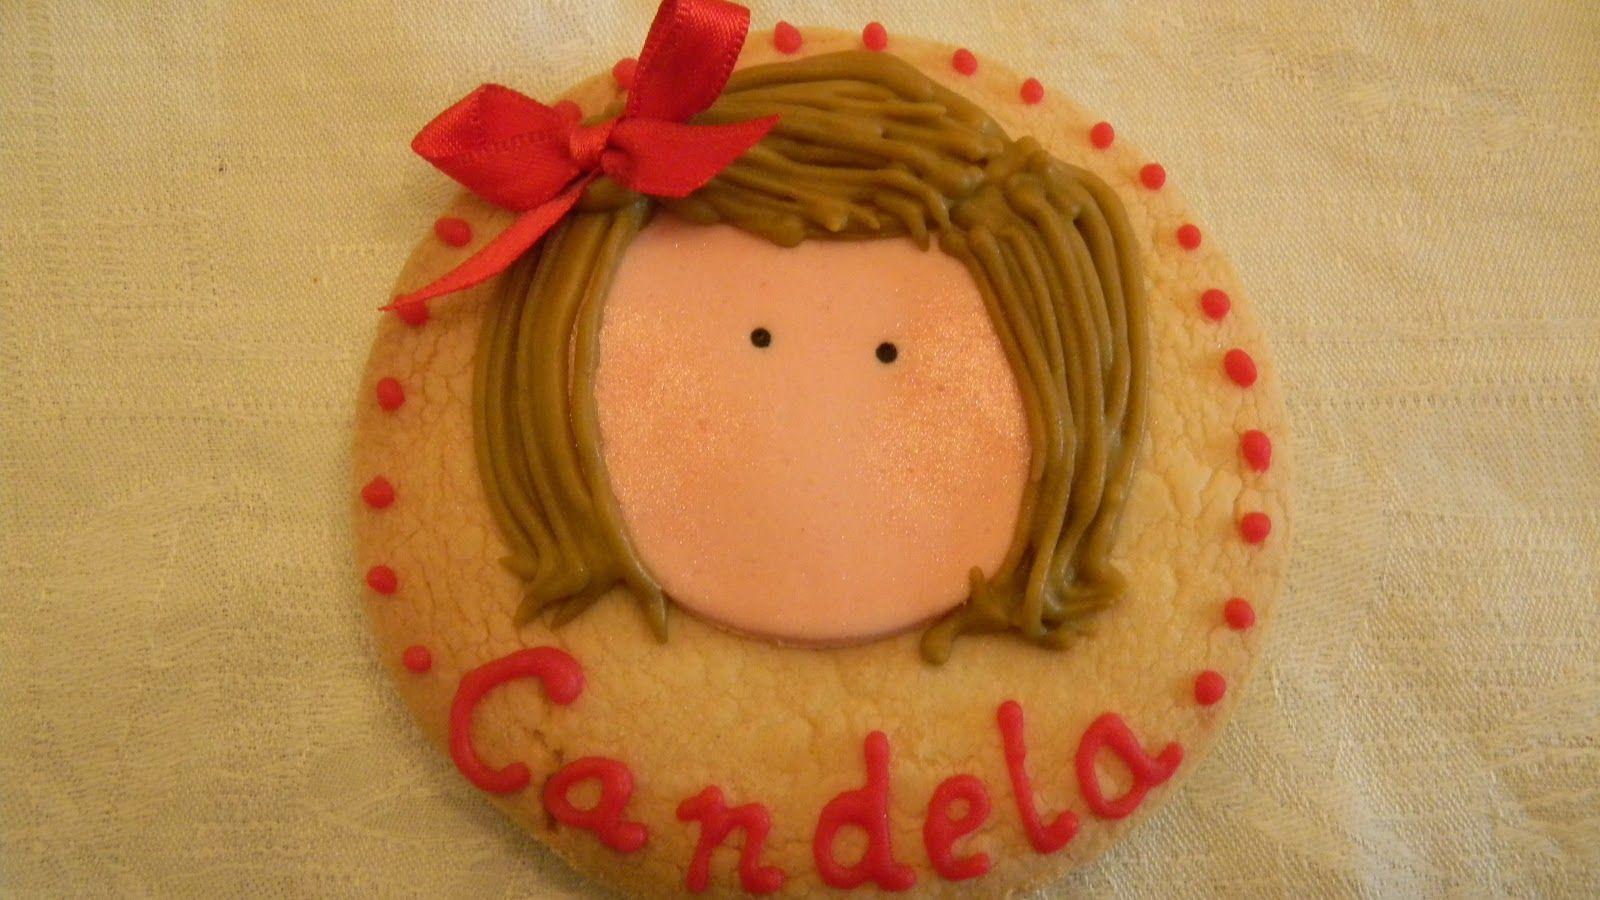 Natali's cooking: Galletas sin gluten para Navidad. Gluten free cookies for Christmas